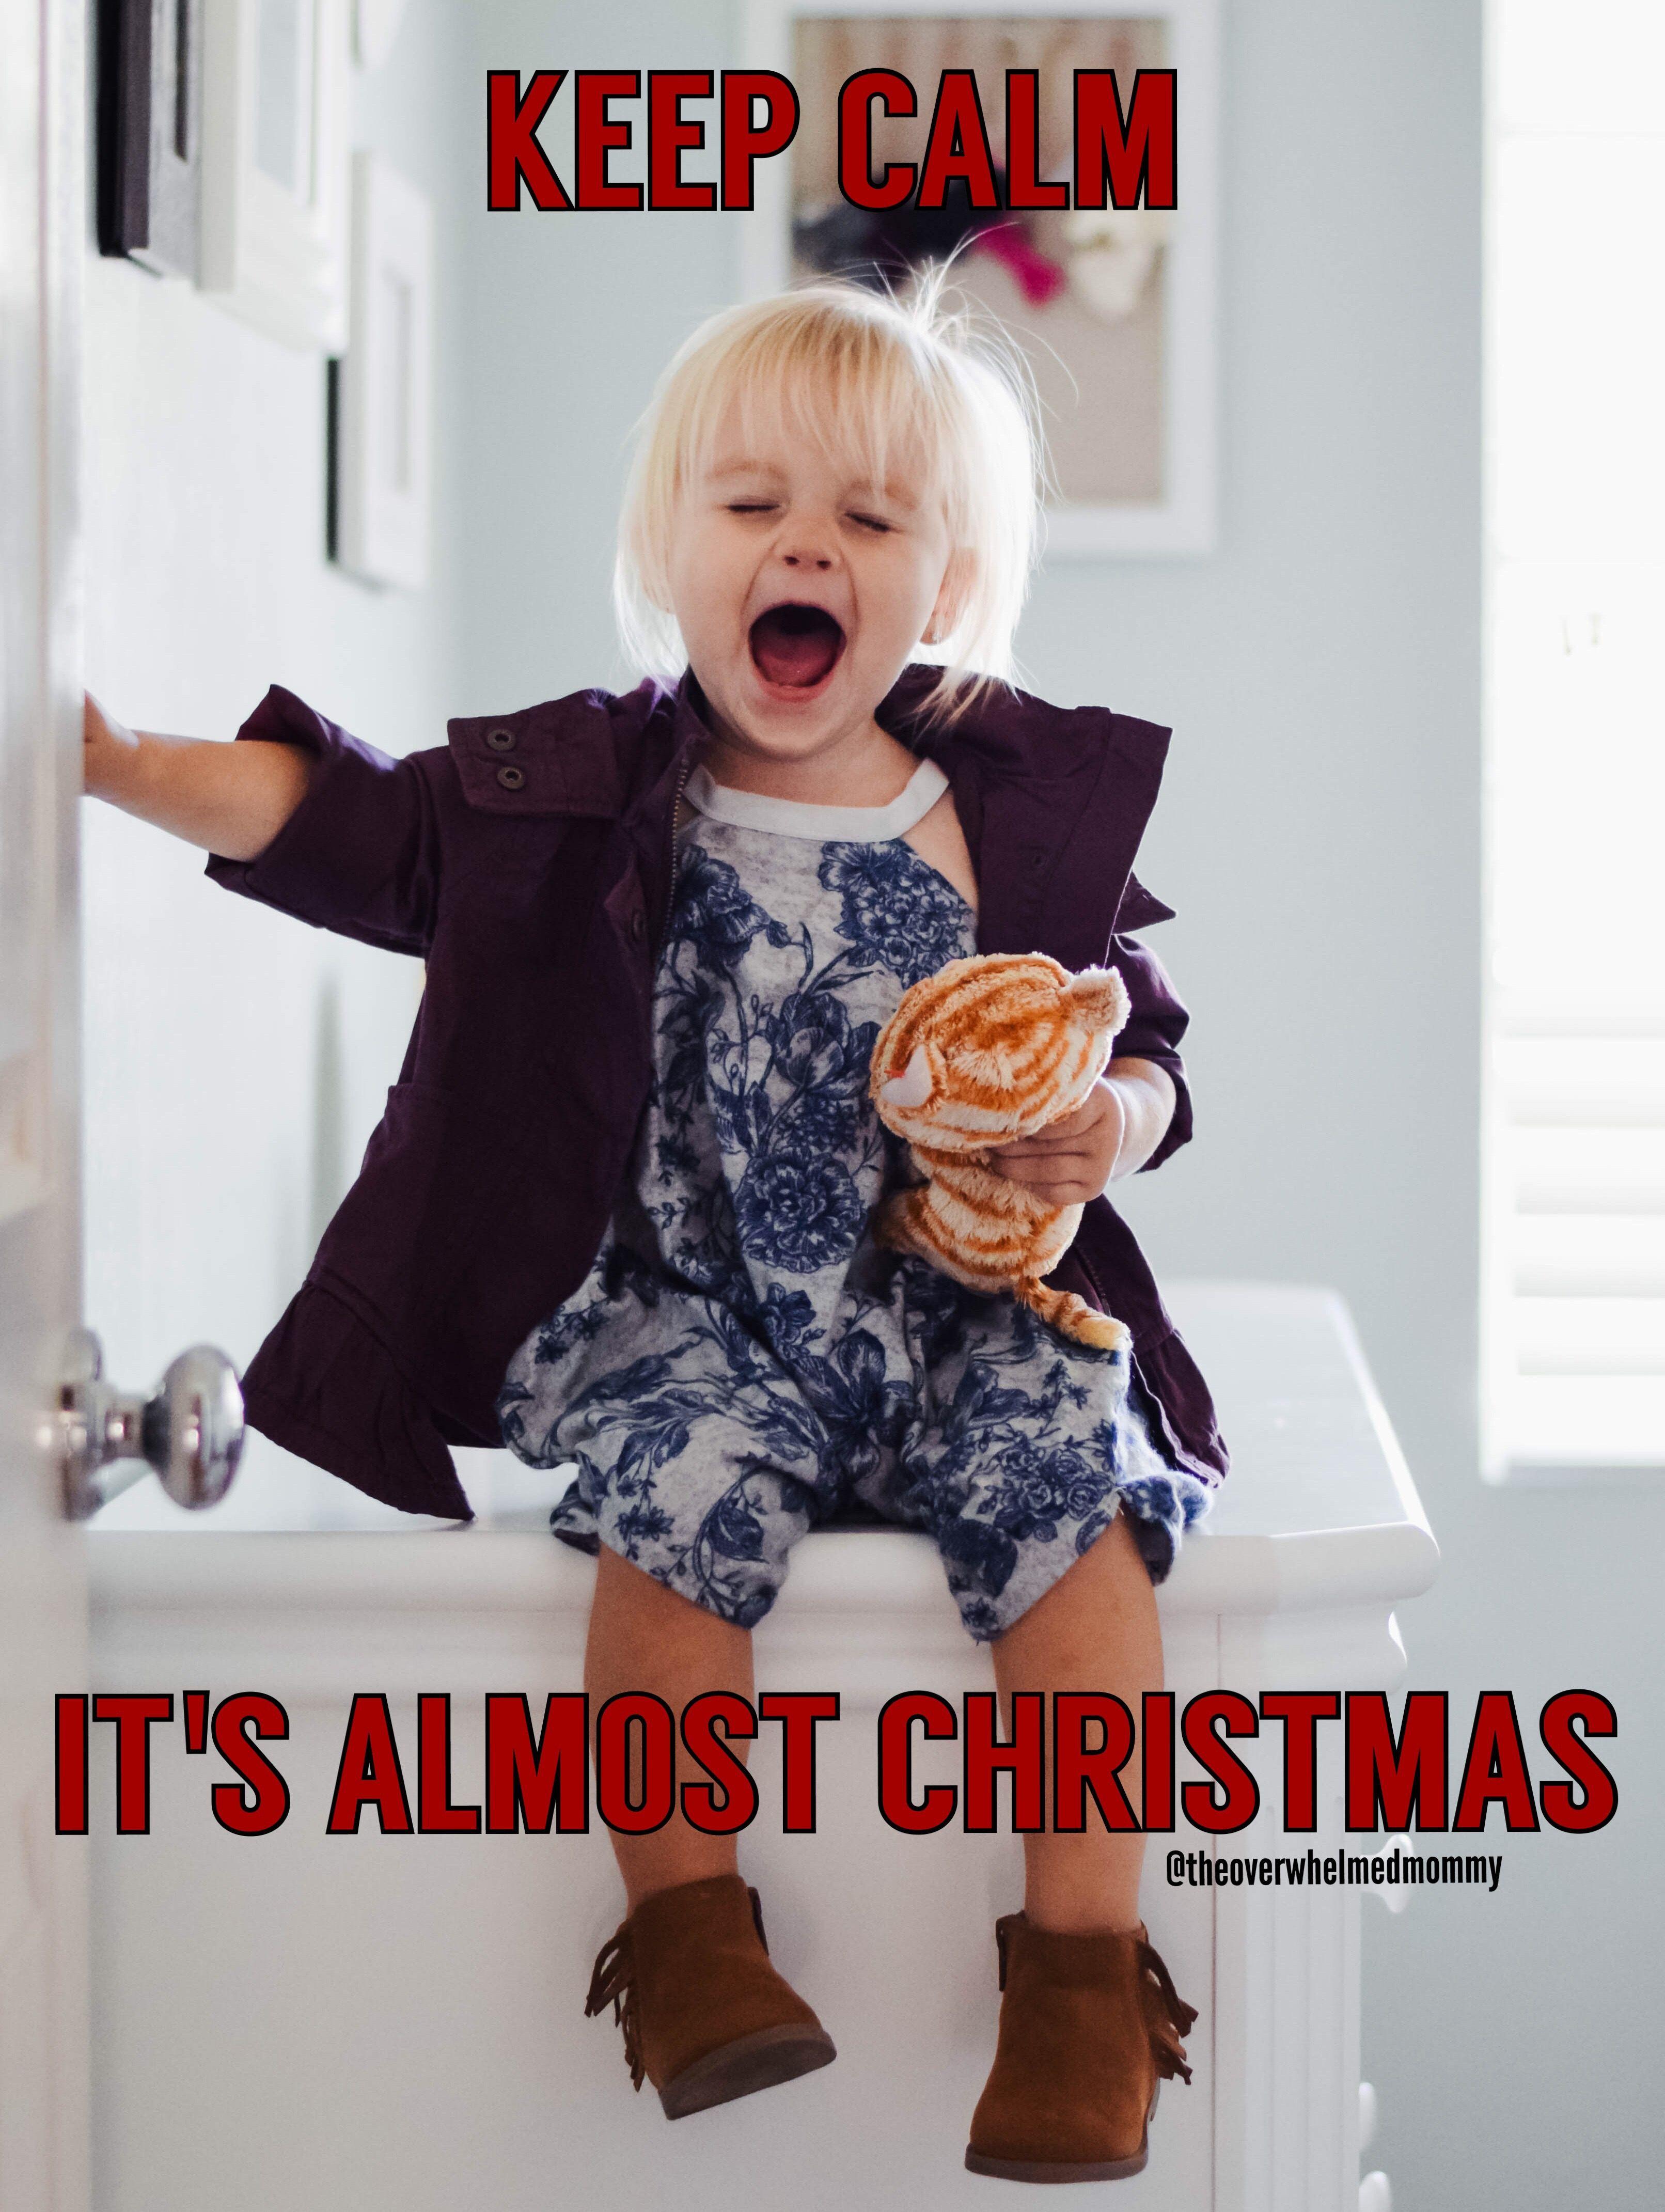 Keep calm, it's almost Christmas! funny Christmas memes